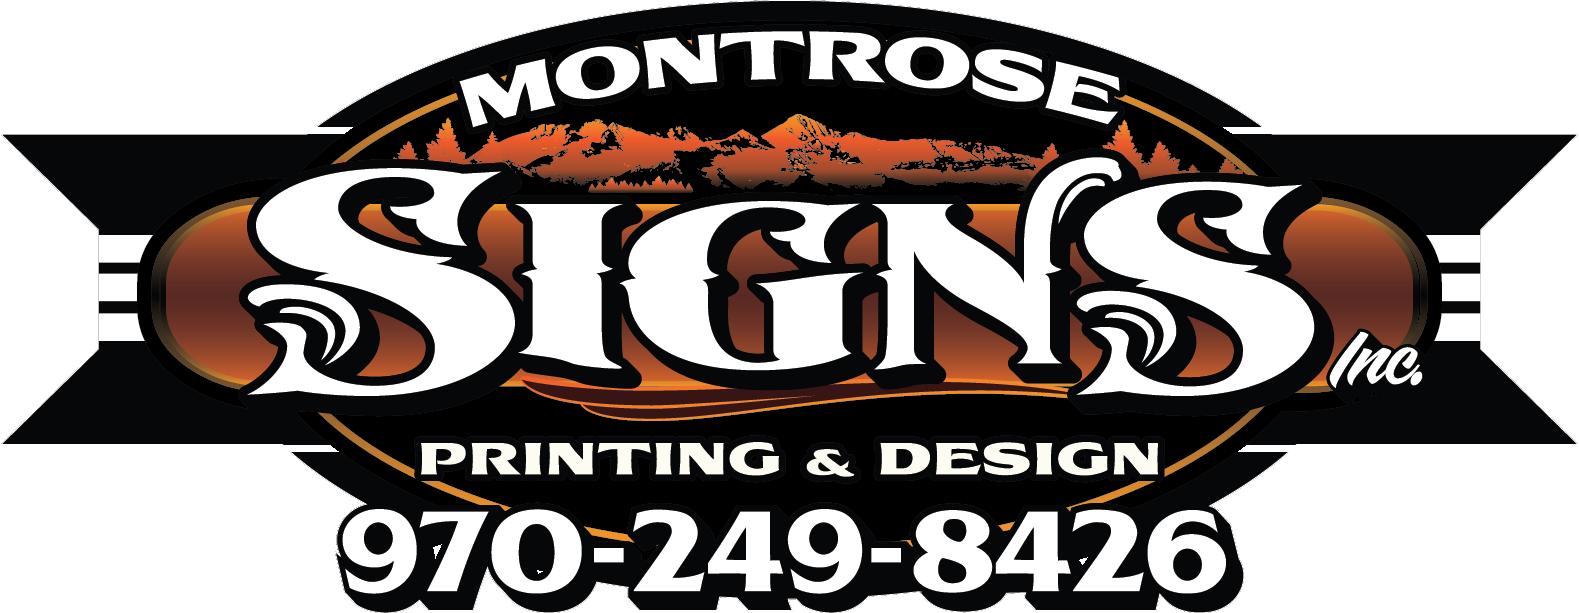 Image result for montrose signs montrose co